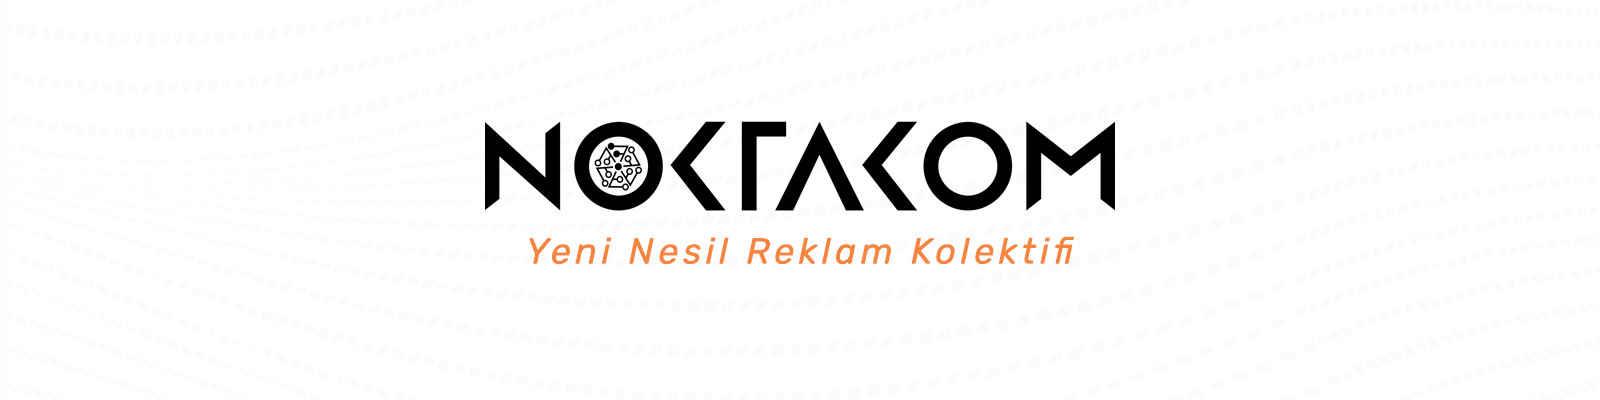 Noktakom Reklam Hizmetleri banner fotograf